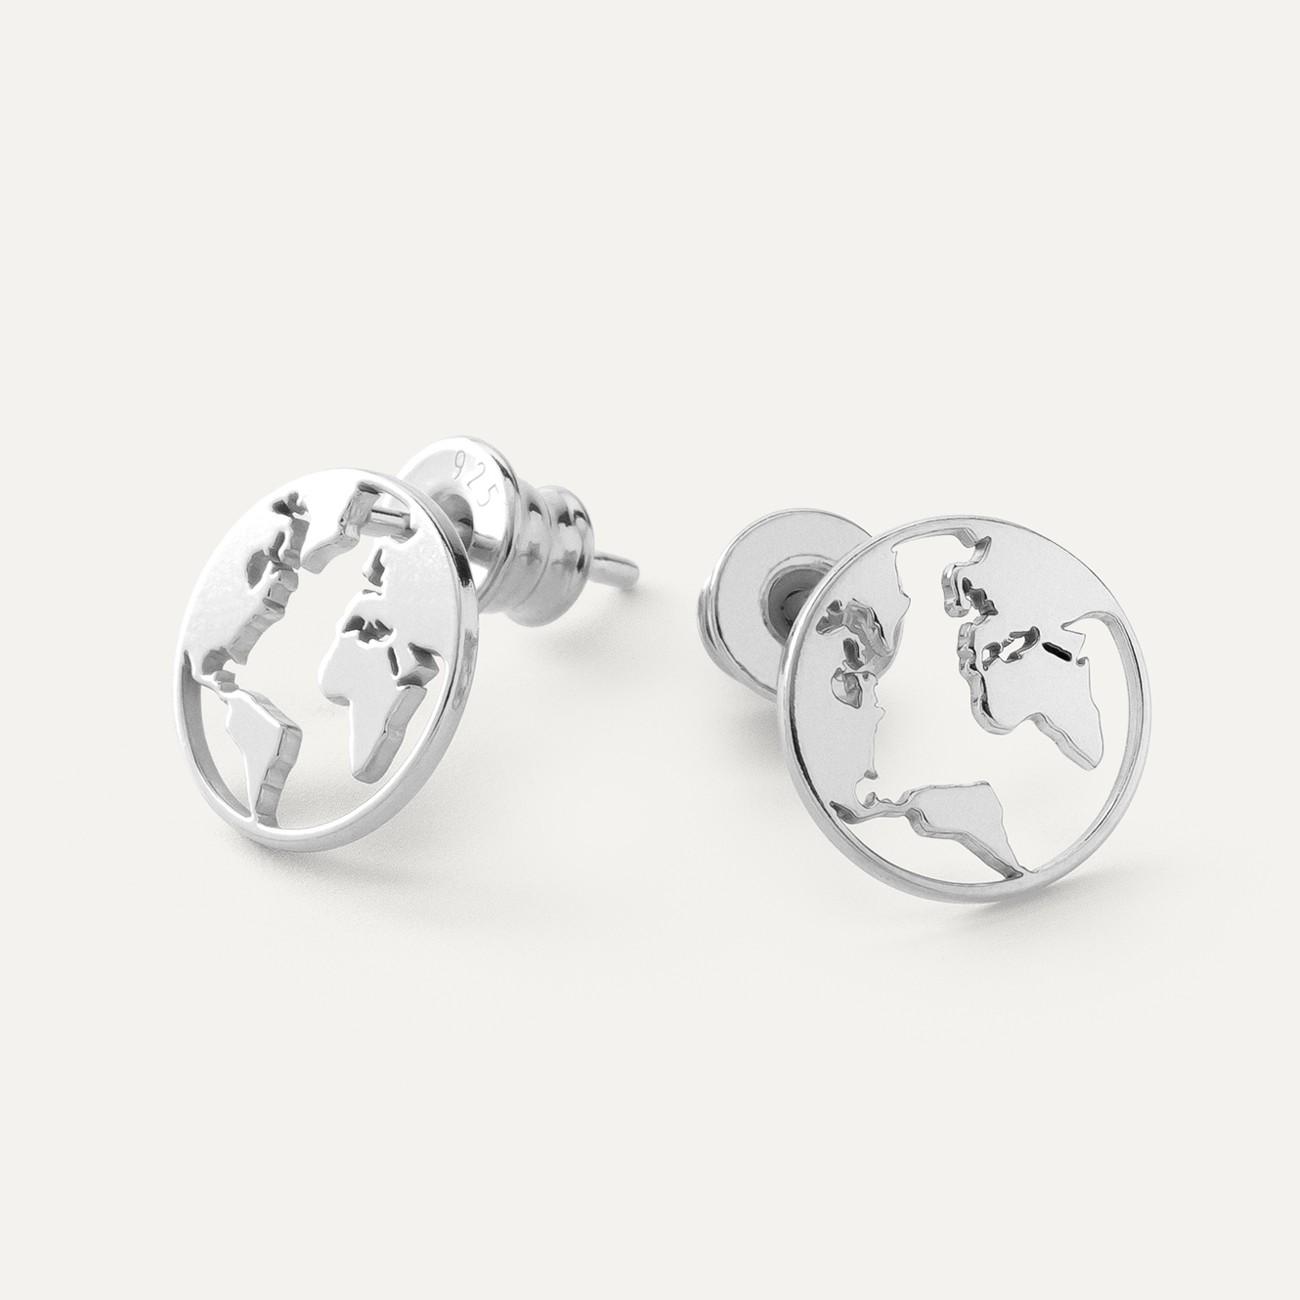 Globo orecchini argento 925 Swarovski